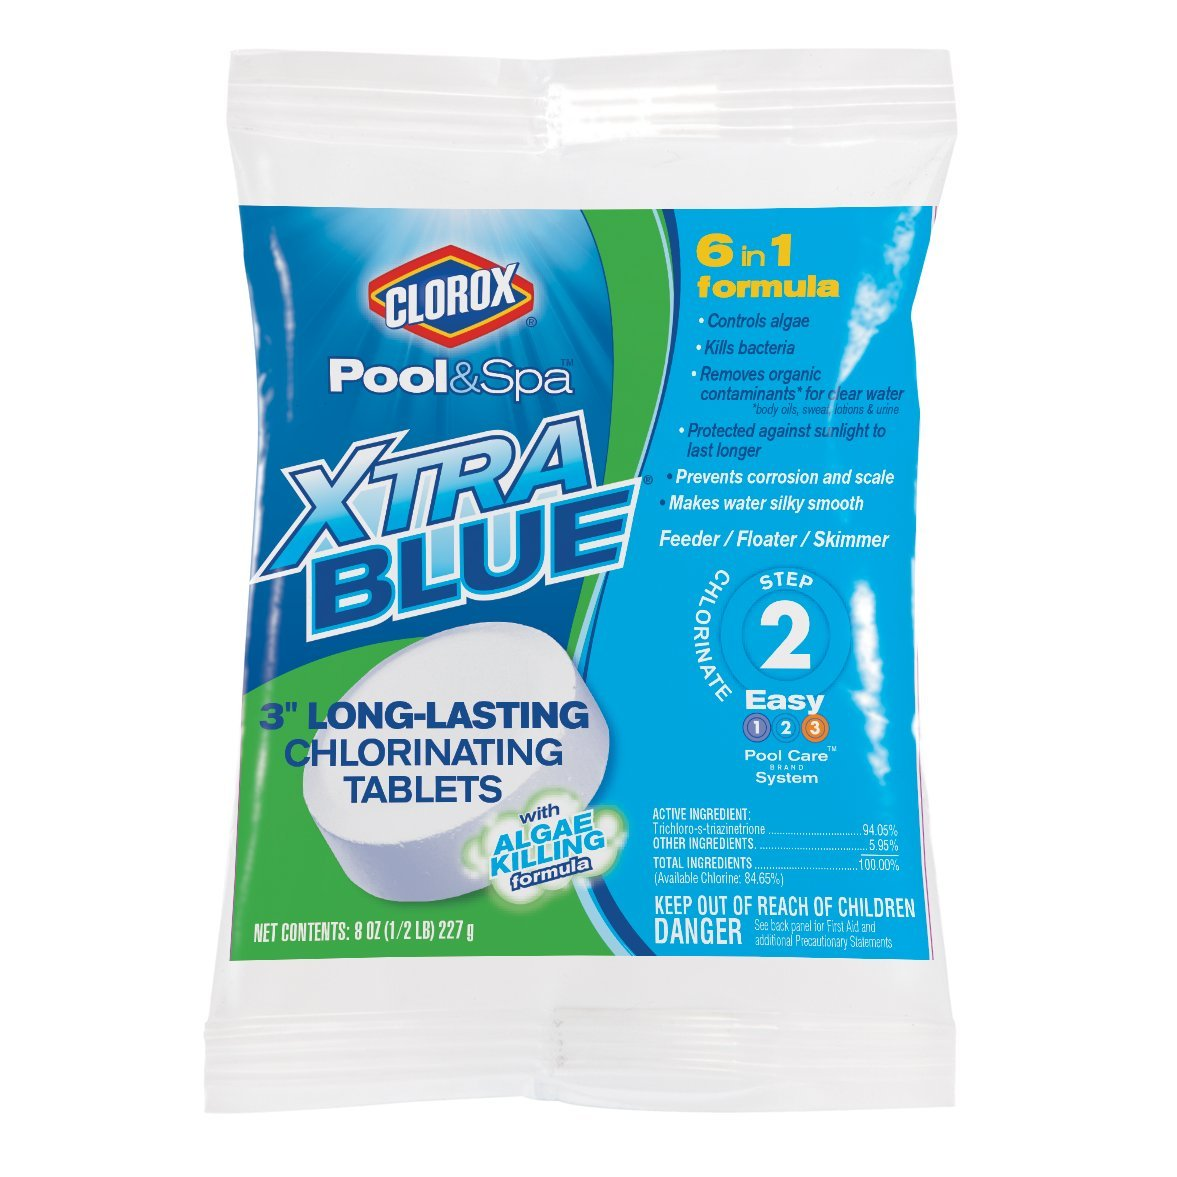 CLOROX Pool&Spa 23000CLX XtraBlue 3'' Long Lasting Chlorinating Tablets by CLOROX Pool&Spa